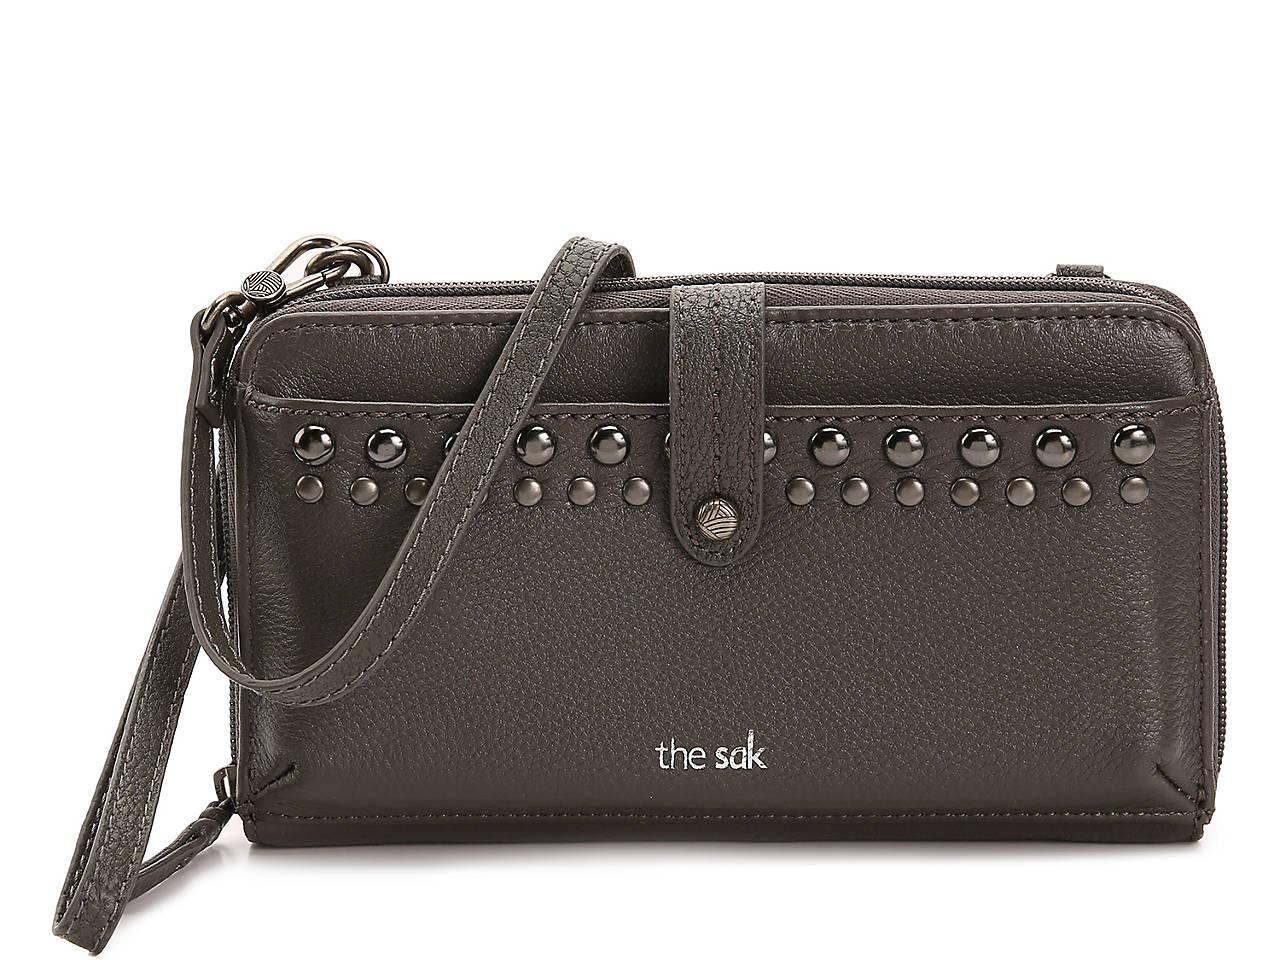 fbe371921e85 The Sak Iris Leather Wallet Women s Handbags   Accessories